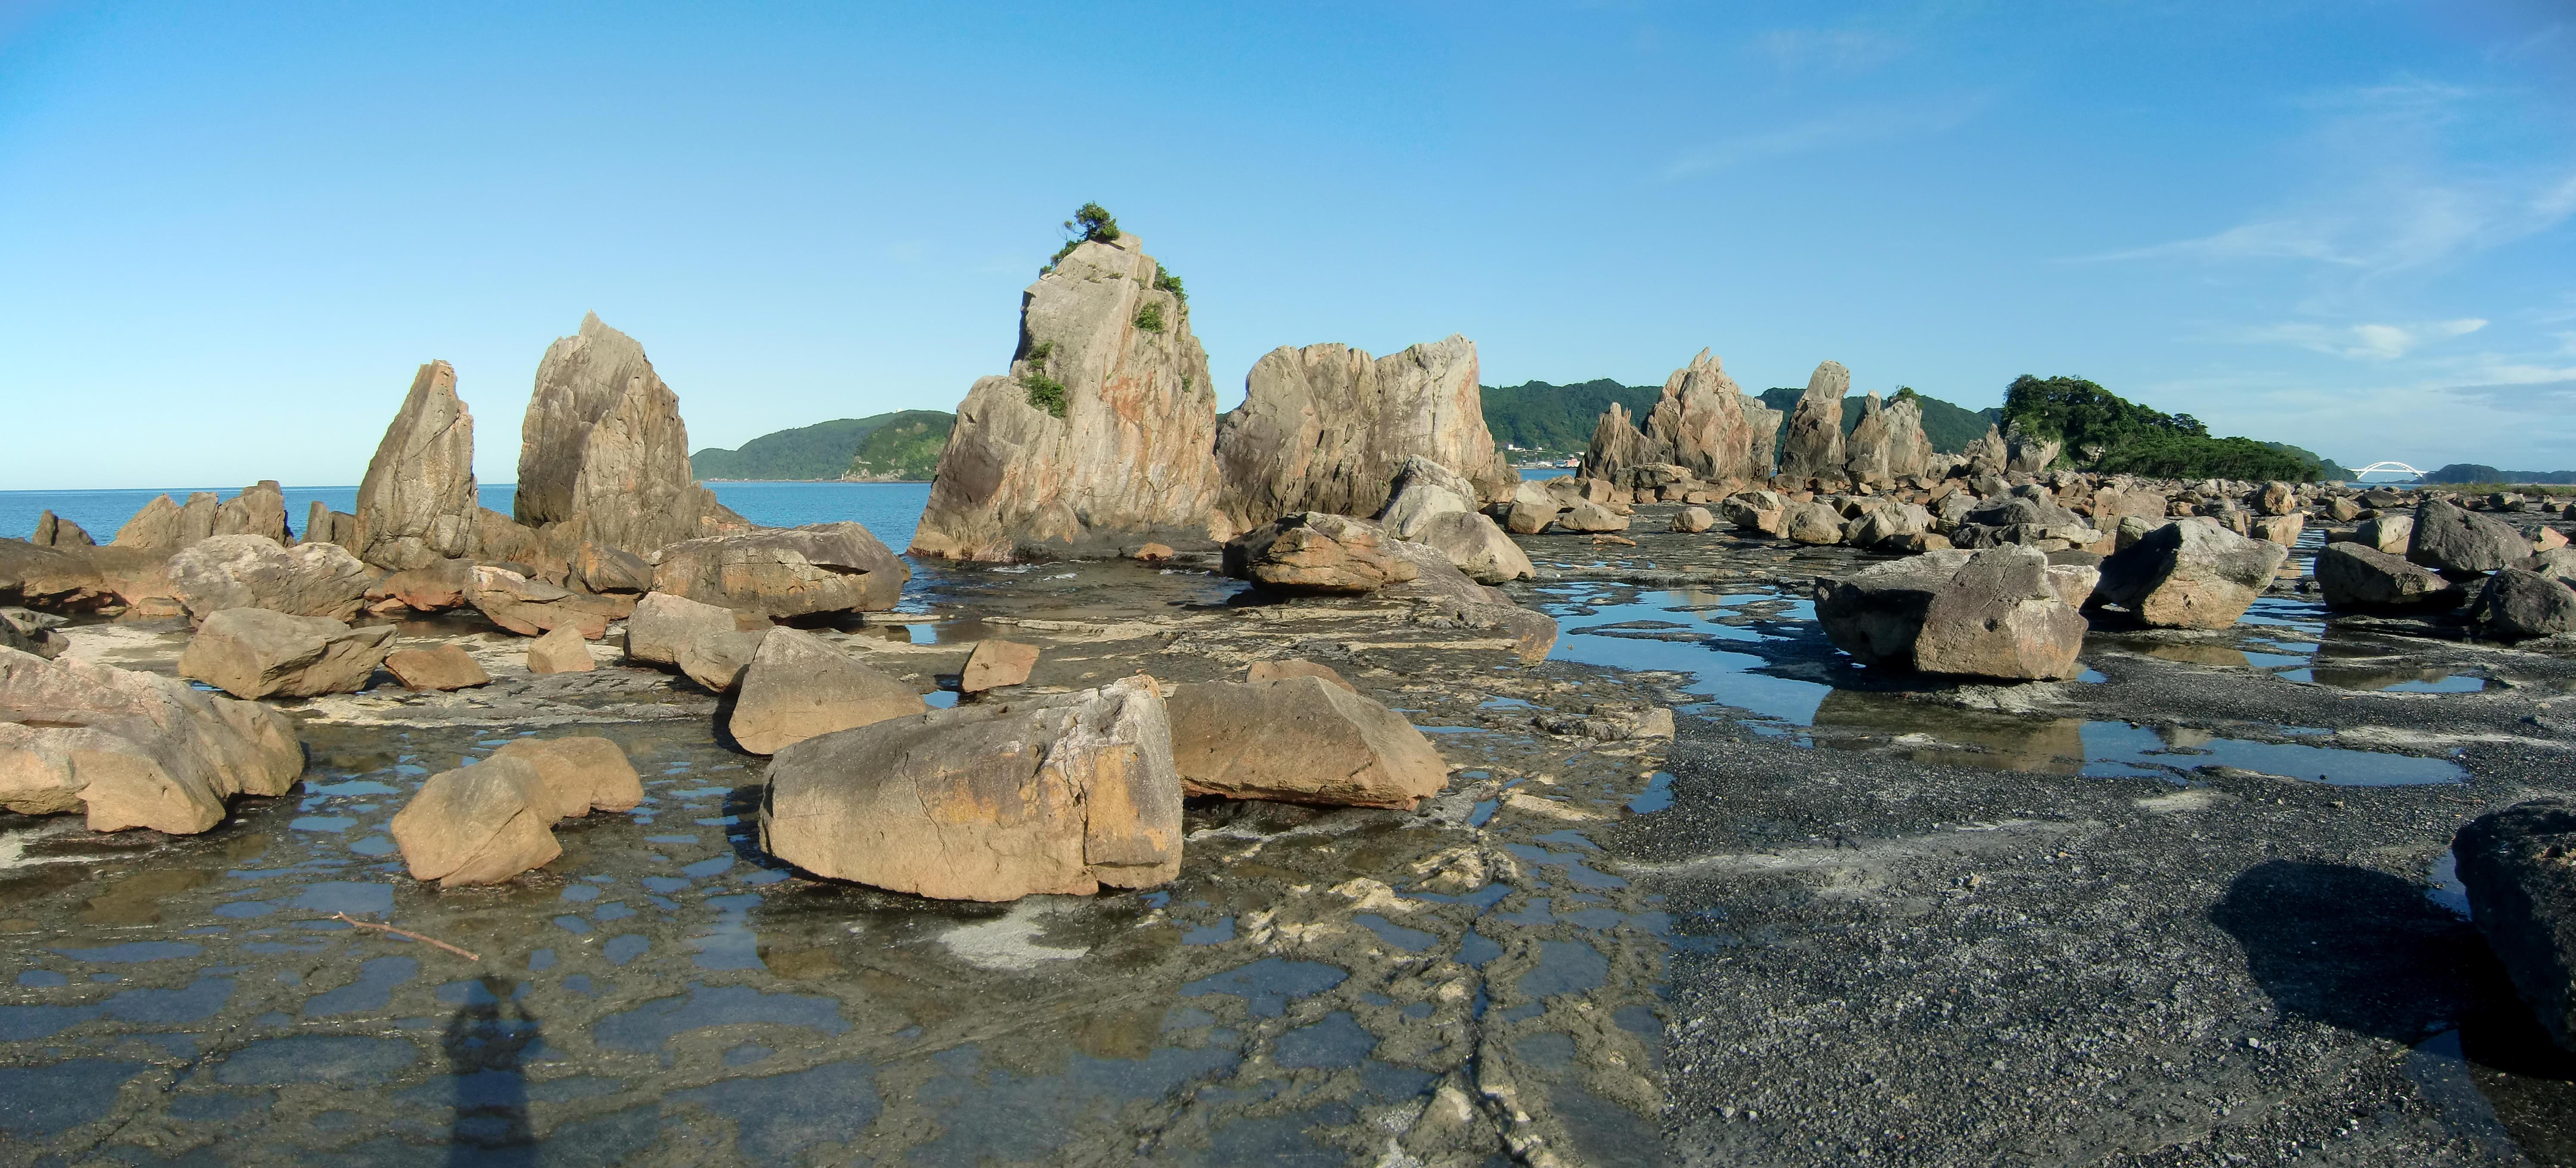 和歌山県串本町の橋杭岩